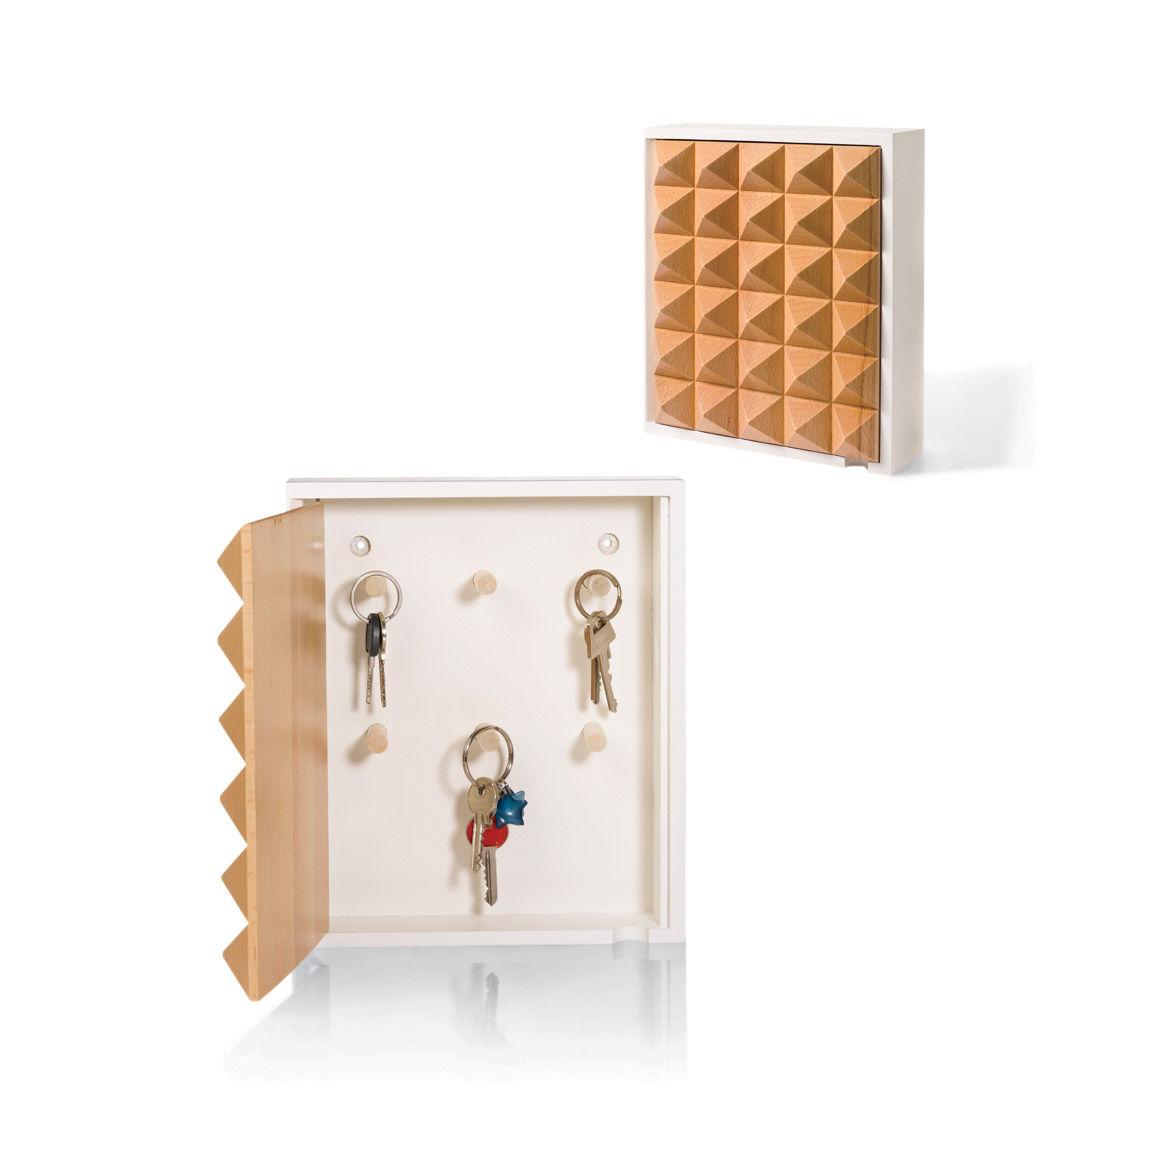 Holiday gift guide 2016 Dwell Store Graduates picks like the birch Korridor pyramid key box